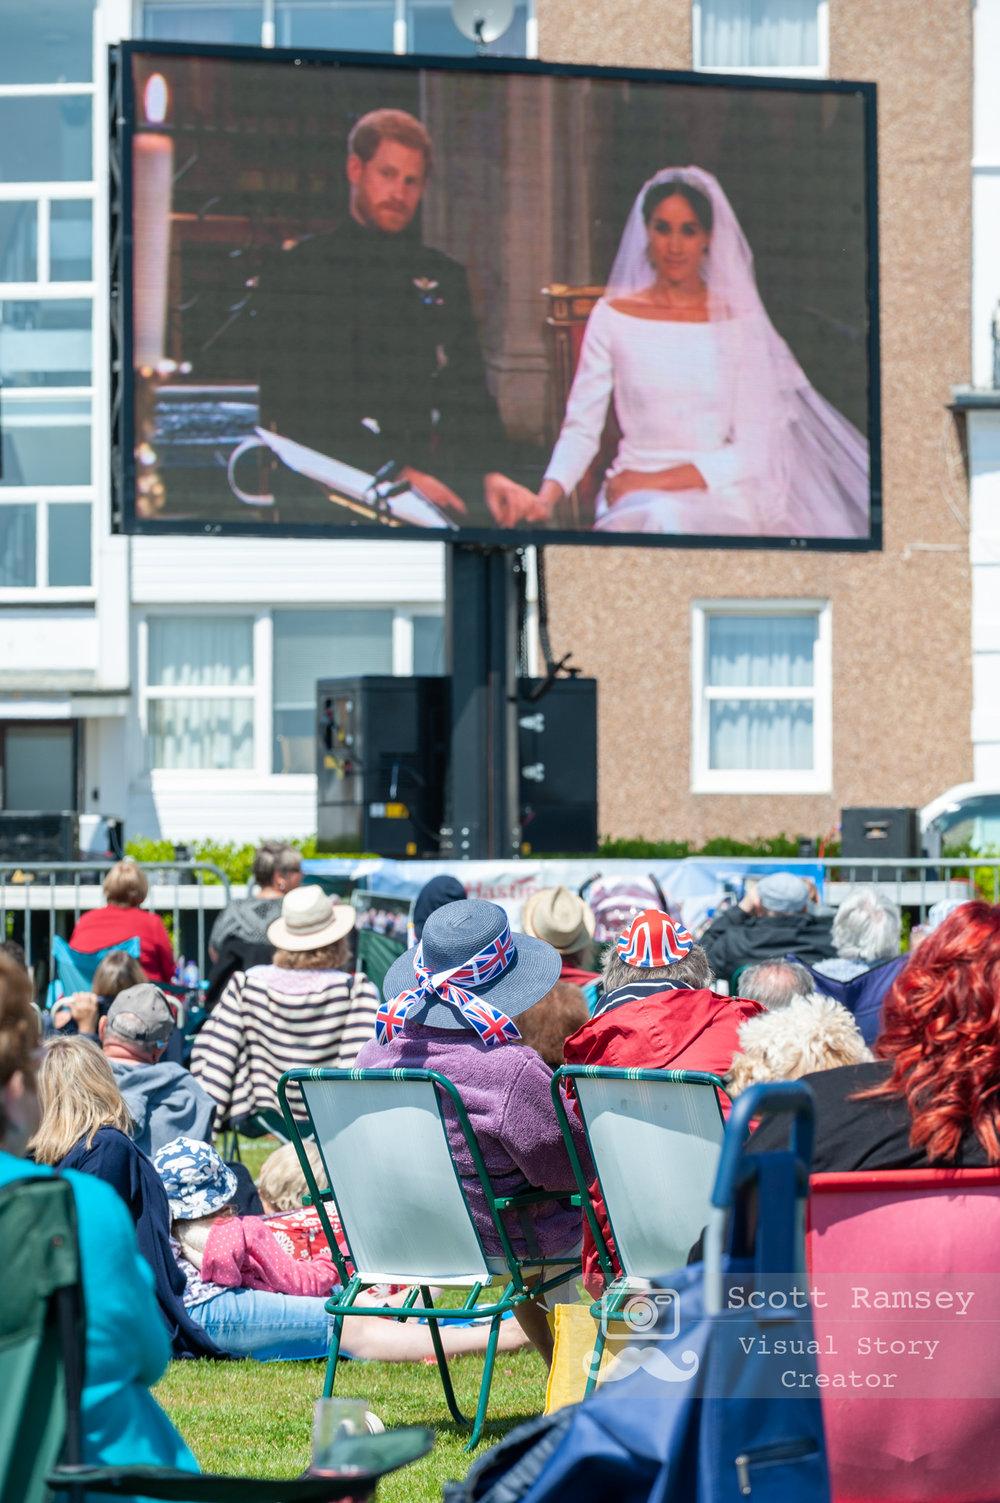 East-Sussex-Editorial-Photographer-Bexhill-Royal-Wedding-Celebrations-©-Scott-Ramsey-www.scottramsey.co.uk-017.jpg